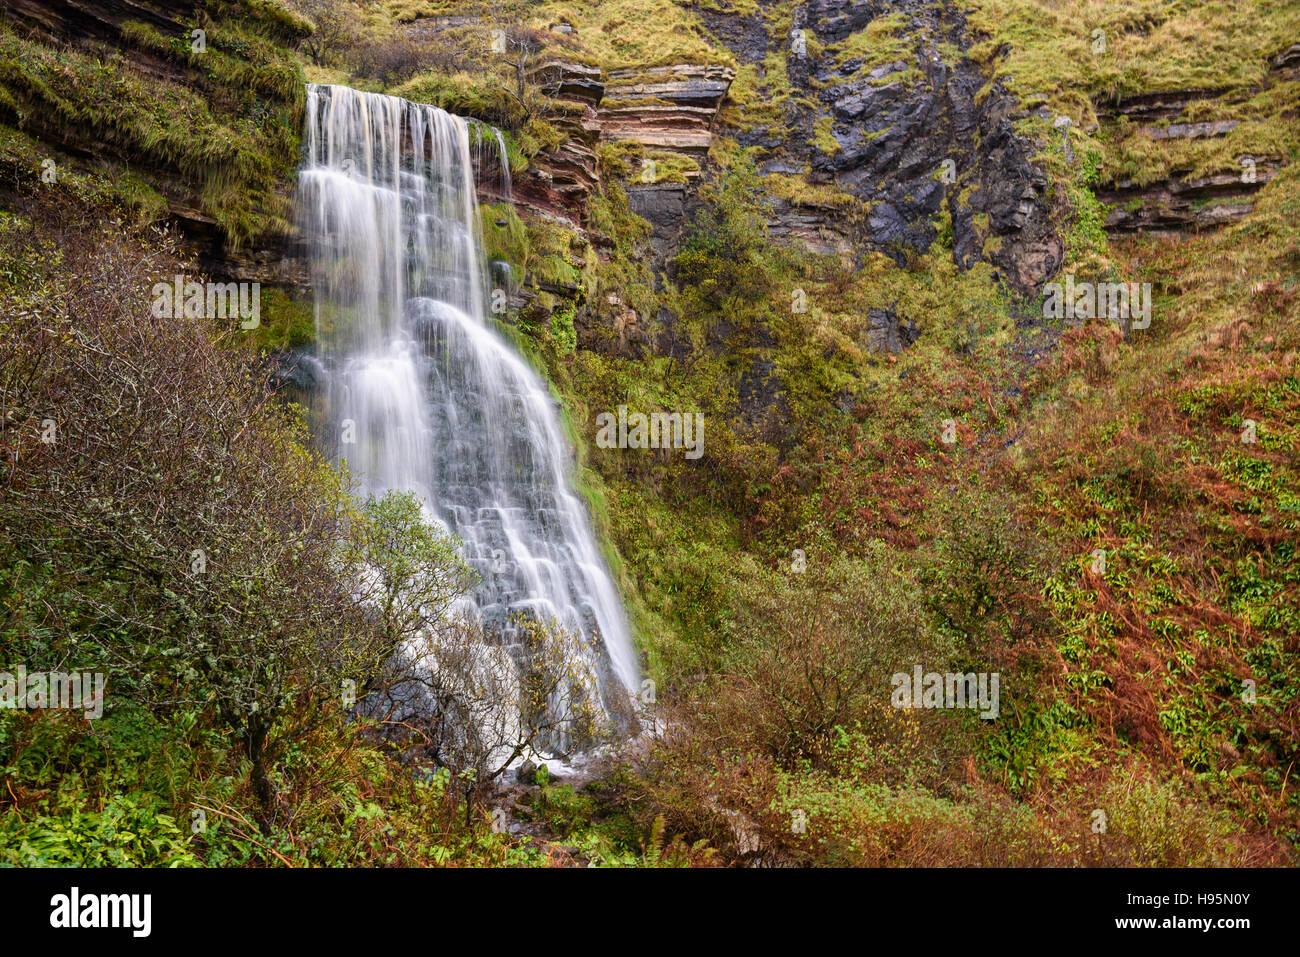 Waterfall near Kildonan shore, Isle of Arran, North Ayrshire, Scotland - Stock Image